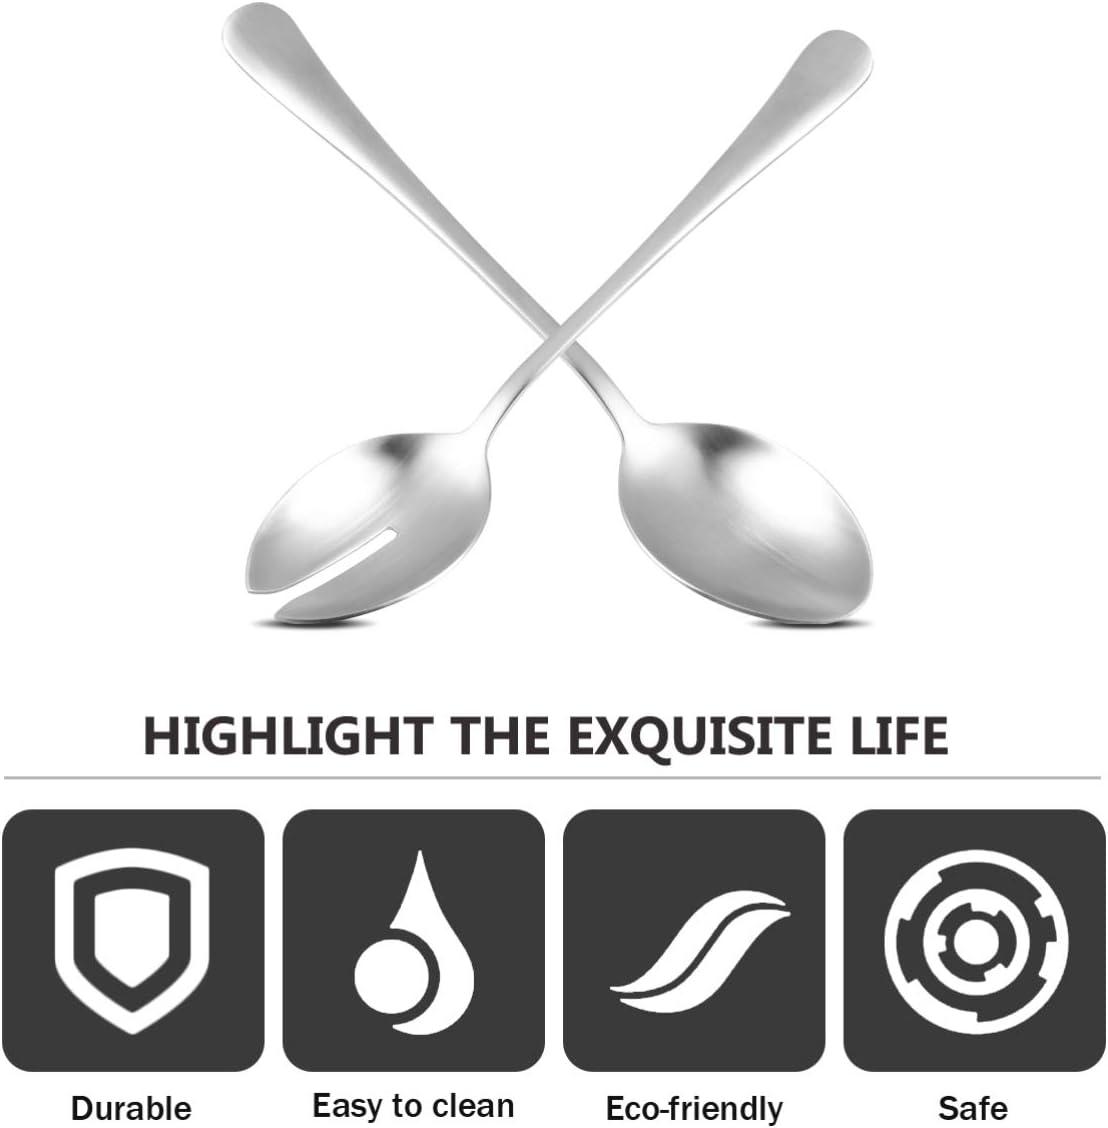 26 cm Salad Cutlery Fork and Spoon Metal Salad Serving Spoon and Fork Set Hemoton Salad Salad Servers,Stainless Steel